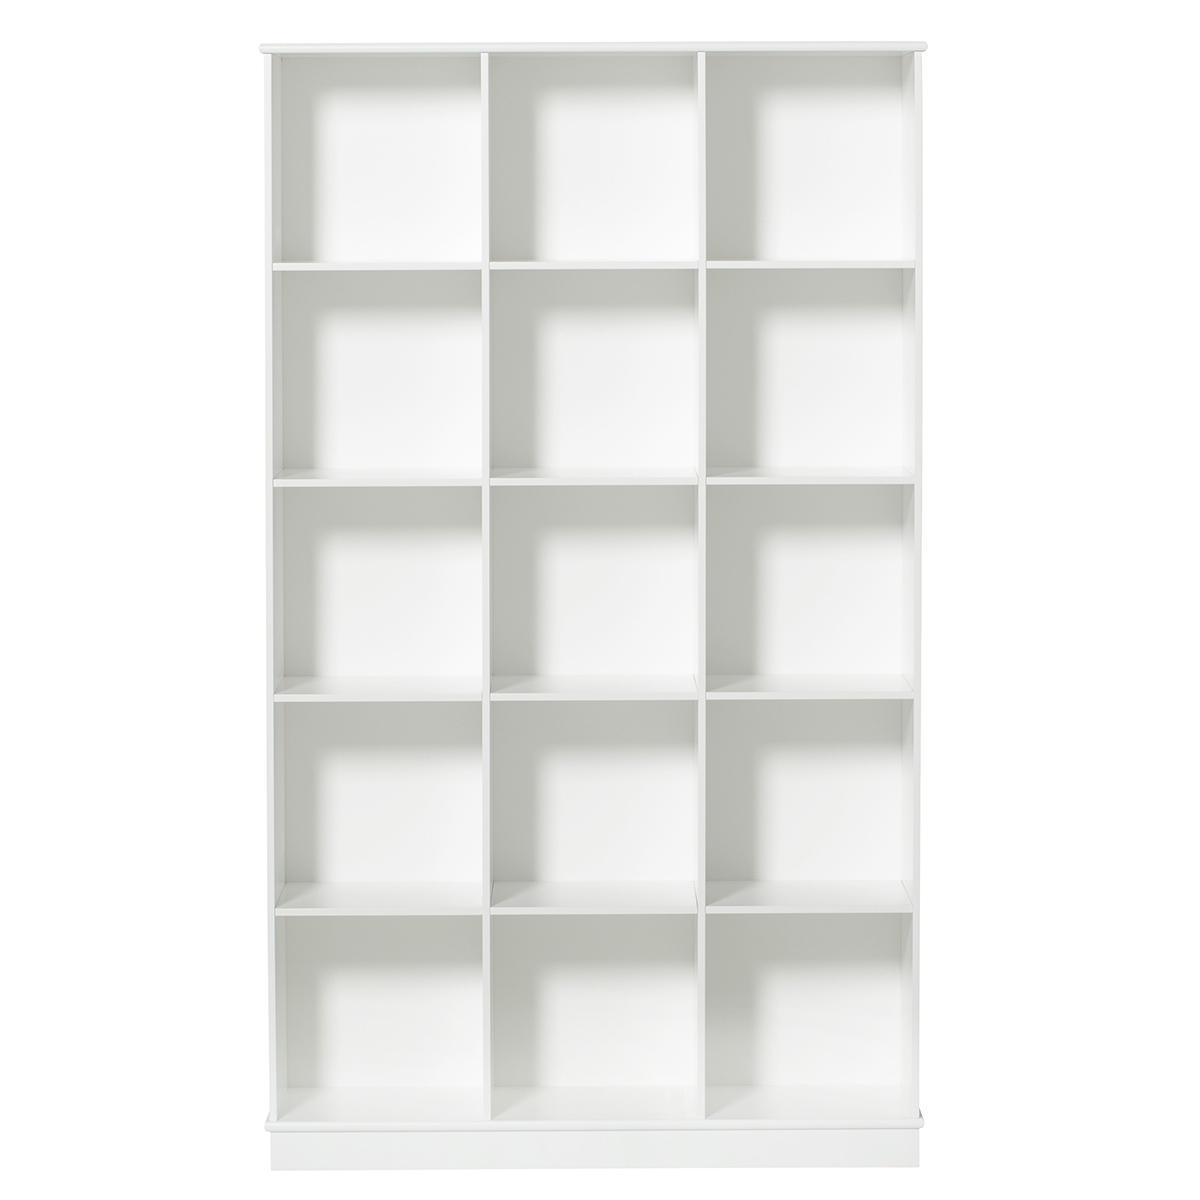 Estantería 104x180cm WOOD Oliver Furniture blanco